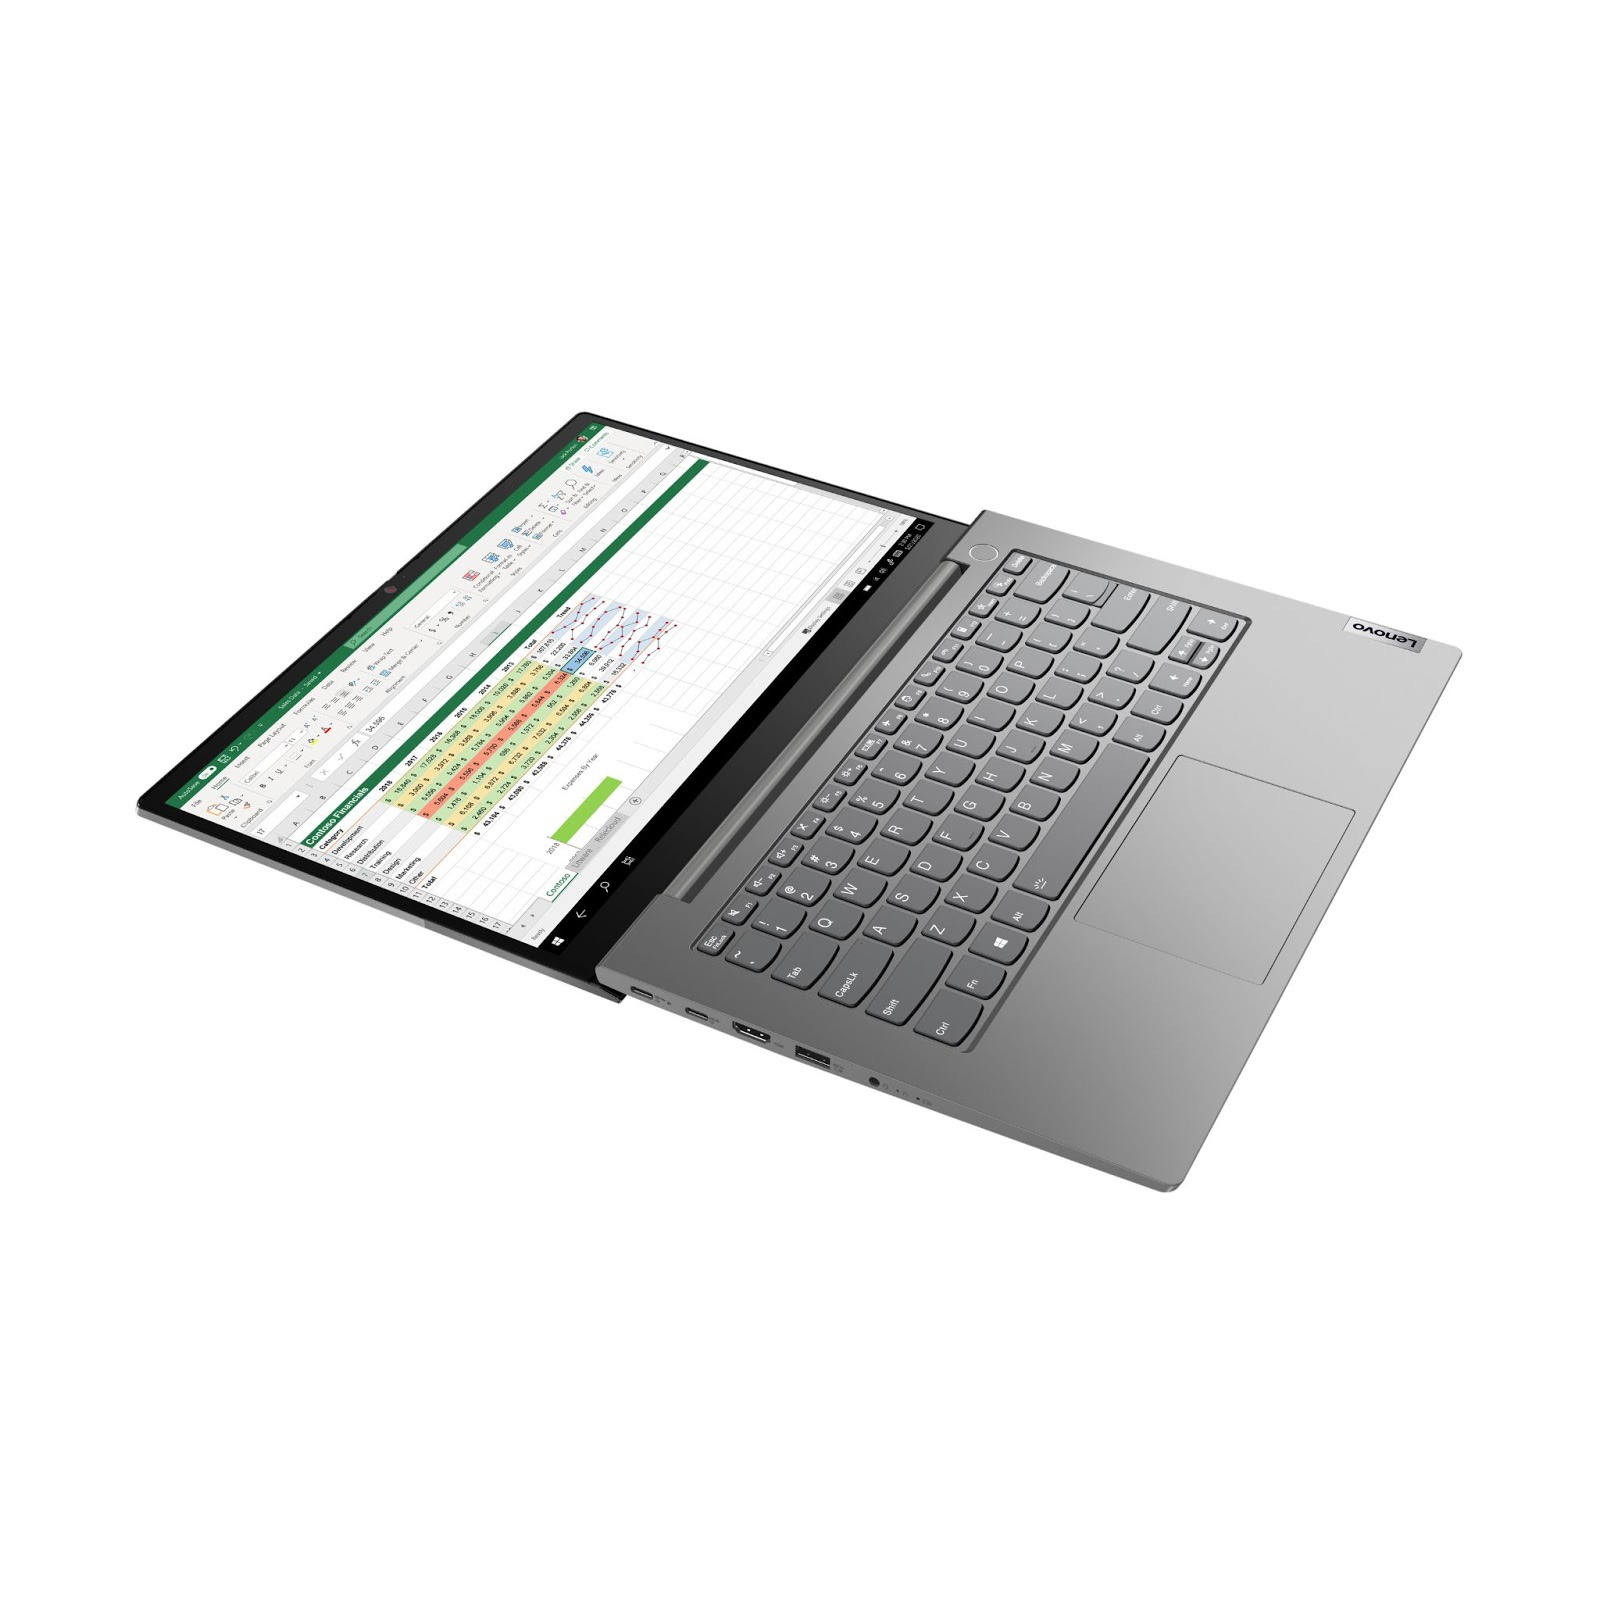 Фото 3. Ноутбук Lenovo ThinkBook 14 2nd Gen ITL Mineral Grey (20VD003ERU)